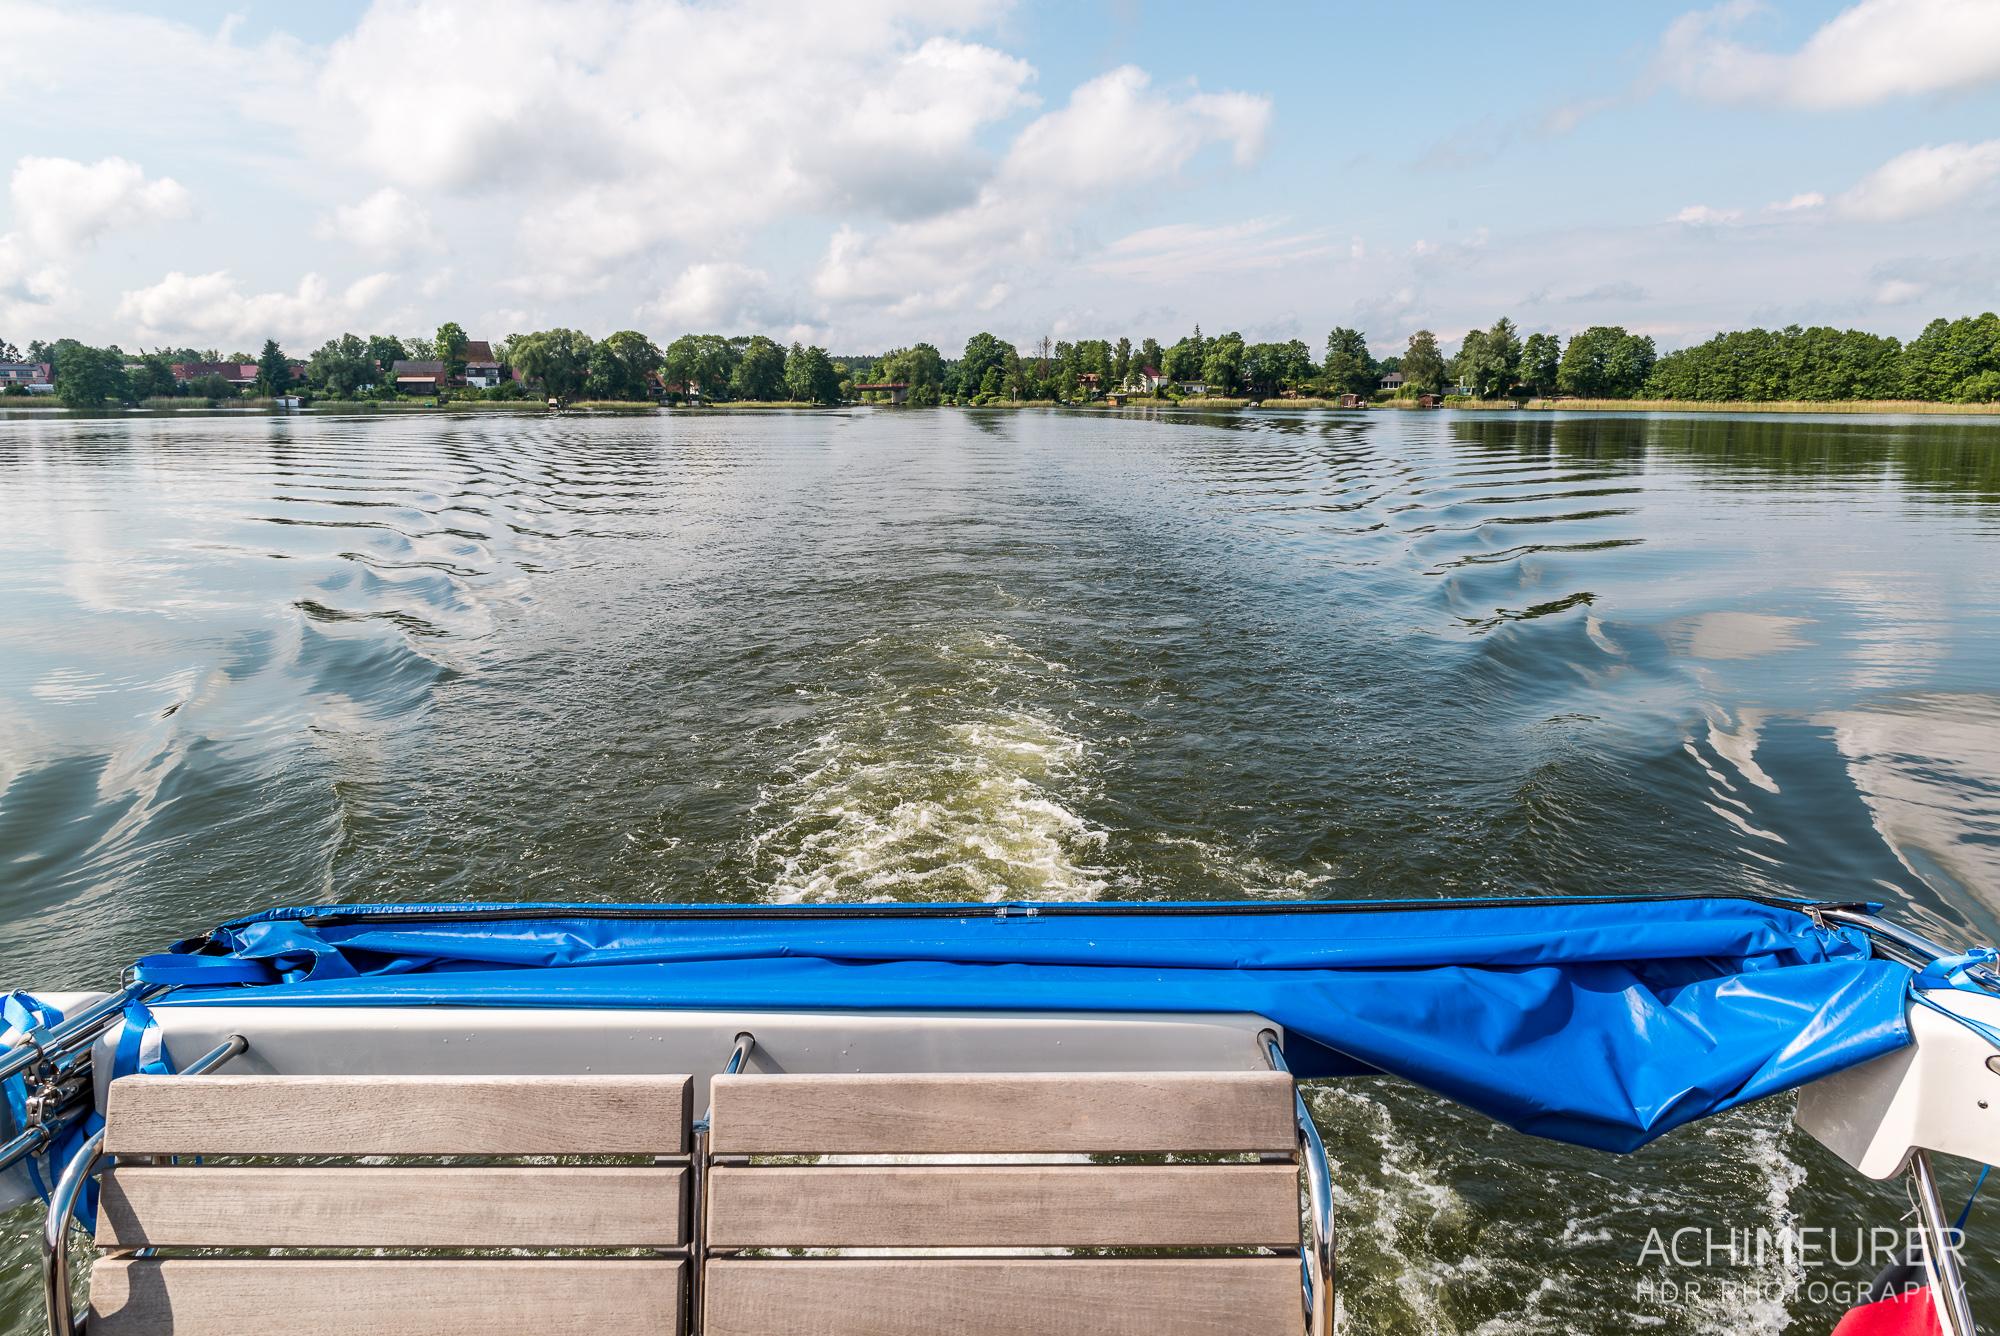 Hausboot-Kuhnle-Mueritz-Mecklenburg-Vorpommern-See_2814